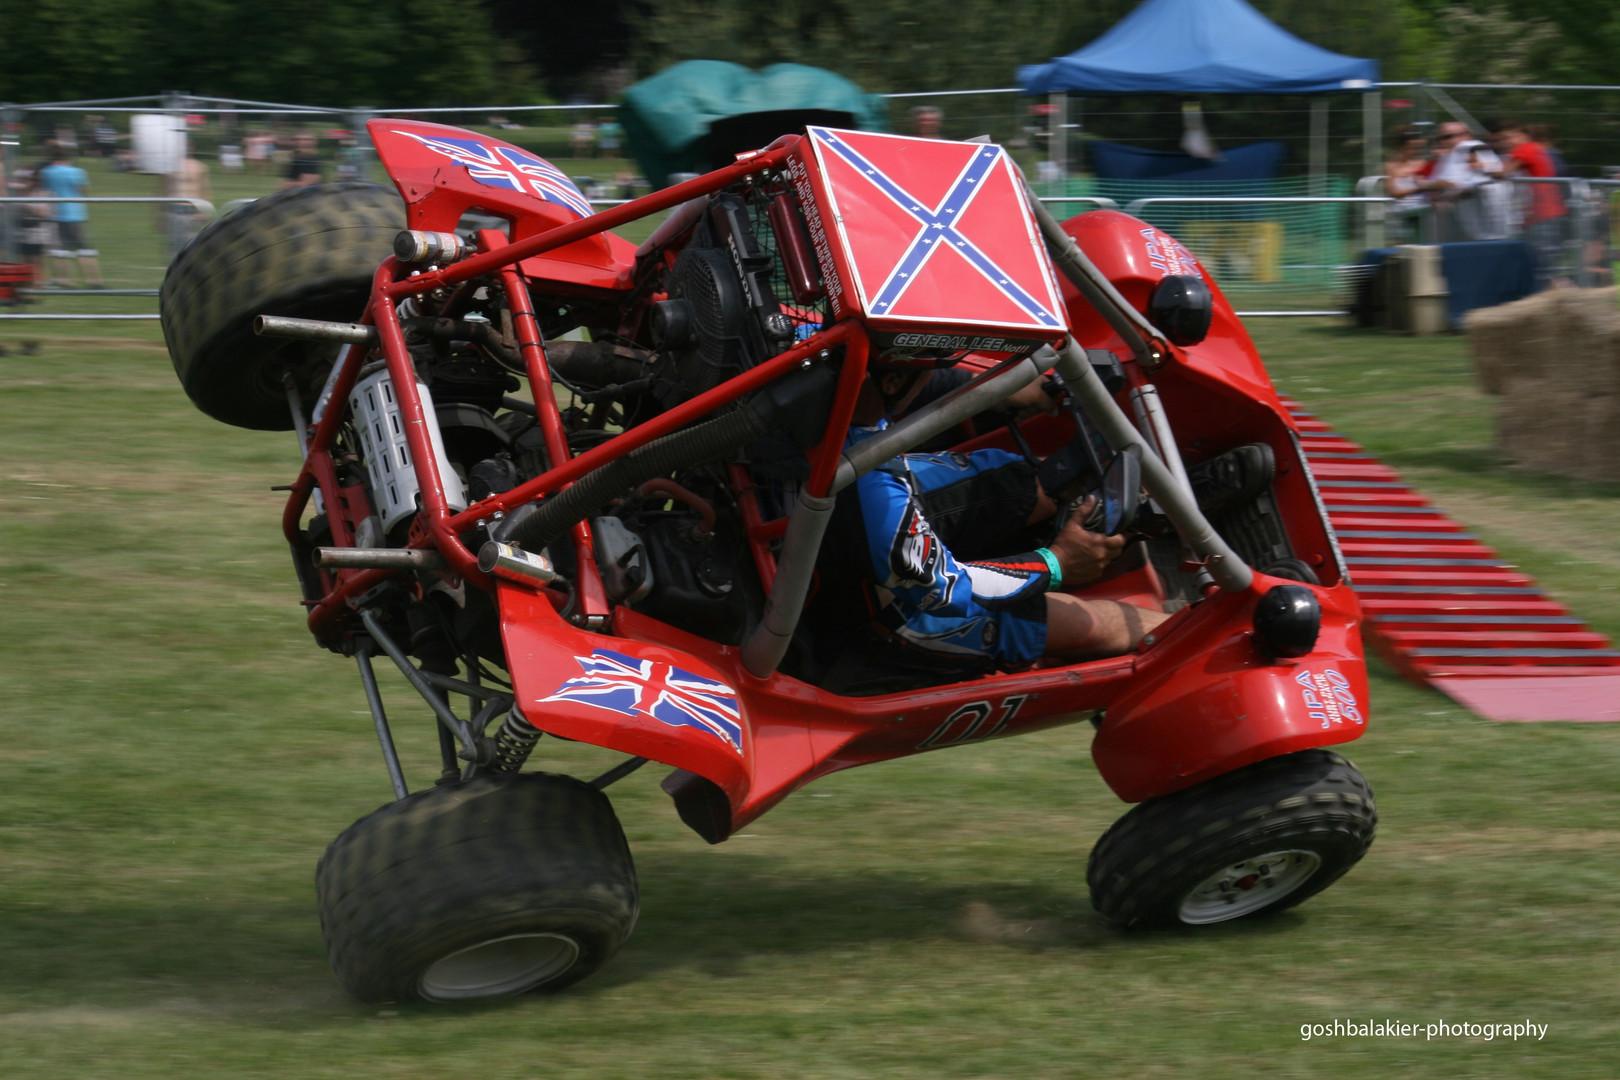 1st buggyshow at horsham 4 5 6th june 20